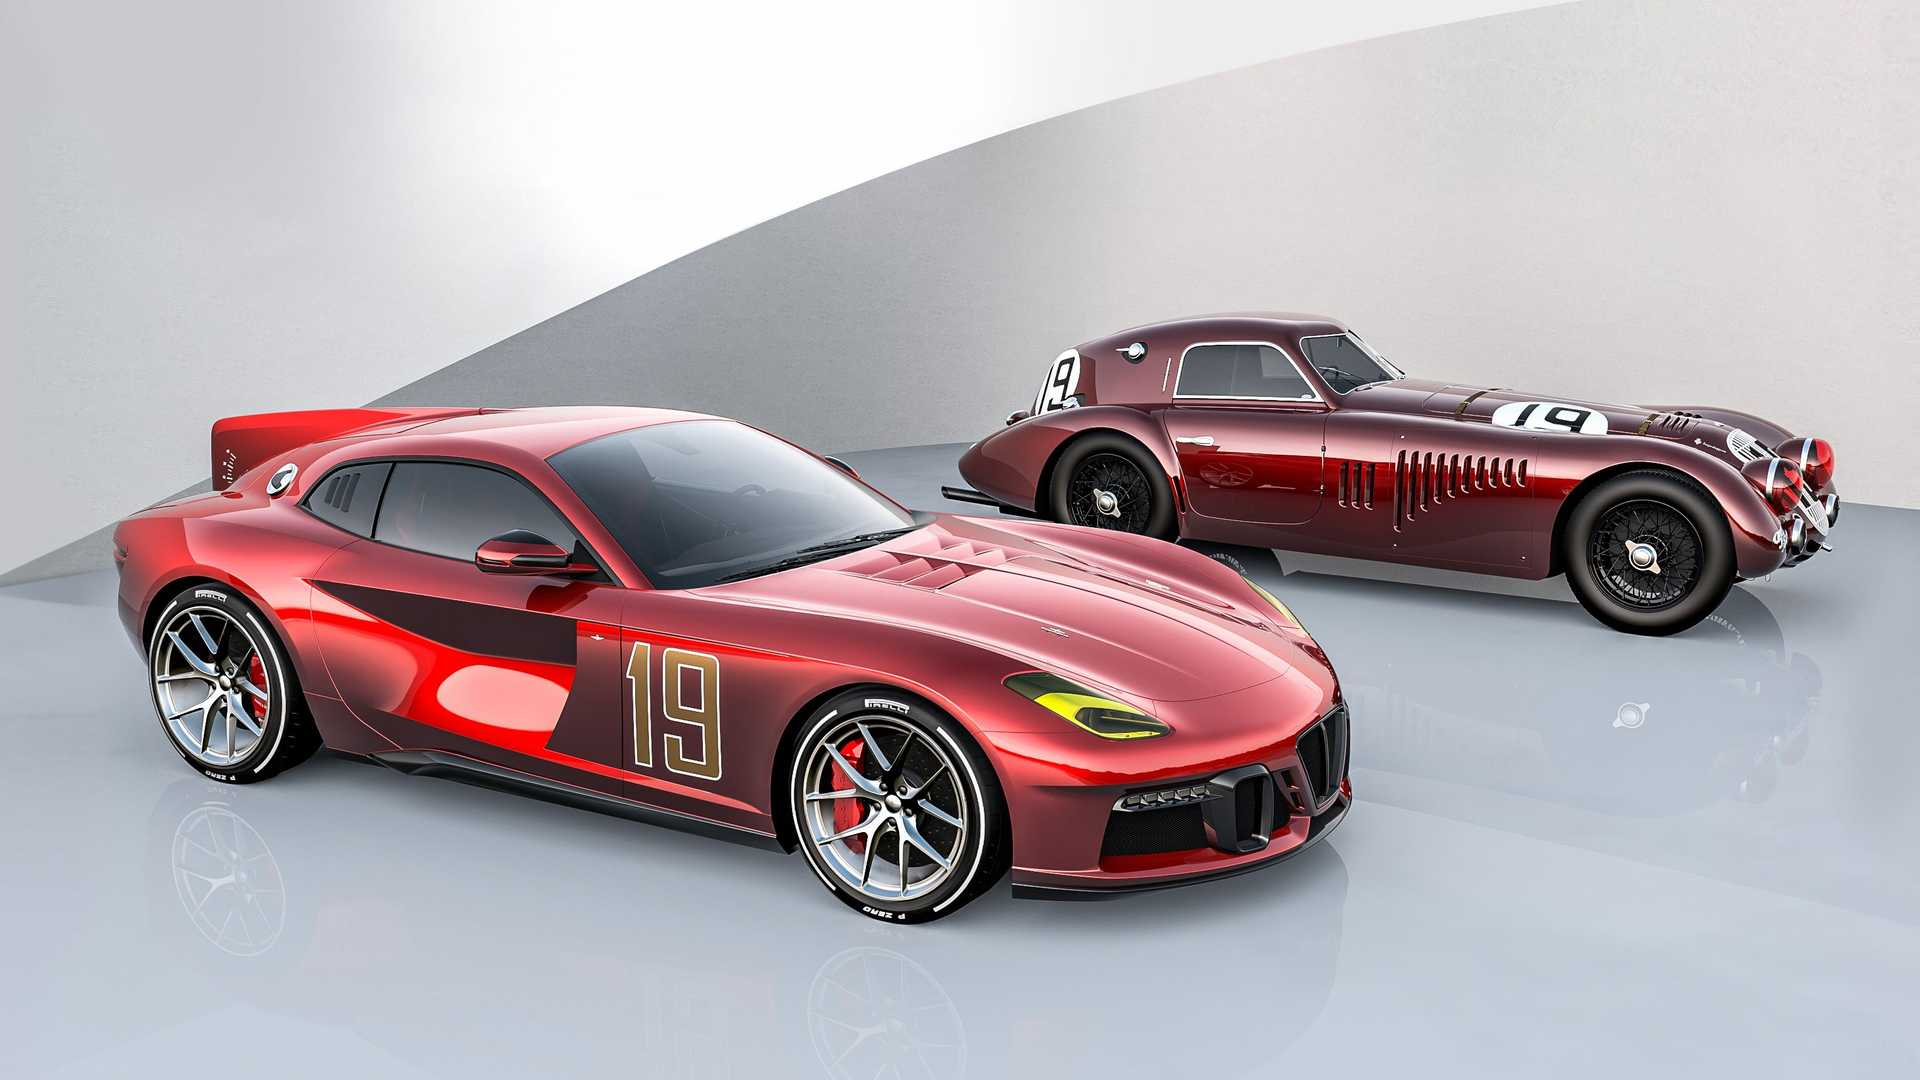 Touring Superleggera reveals Ferrari F12-based Aero 3 coupe